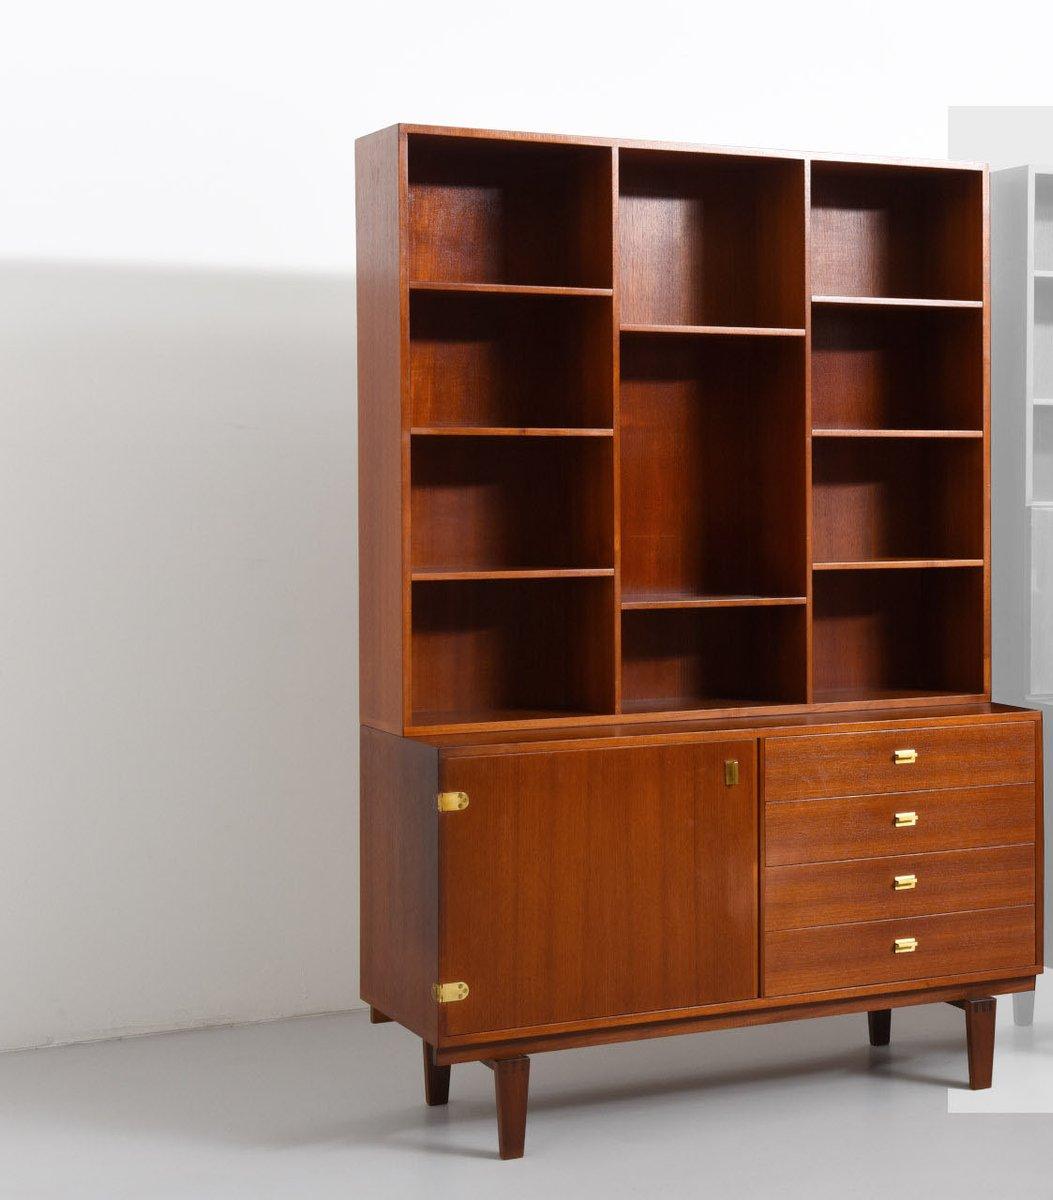 Mid Century Danish Teak Bookcase By Peter Løvig Nielsen 7 3 440 00 Price Per Piece